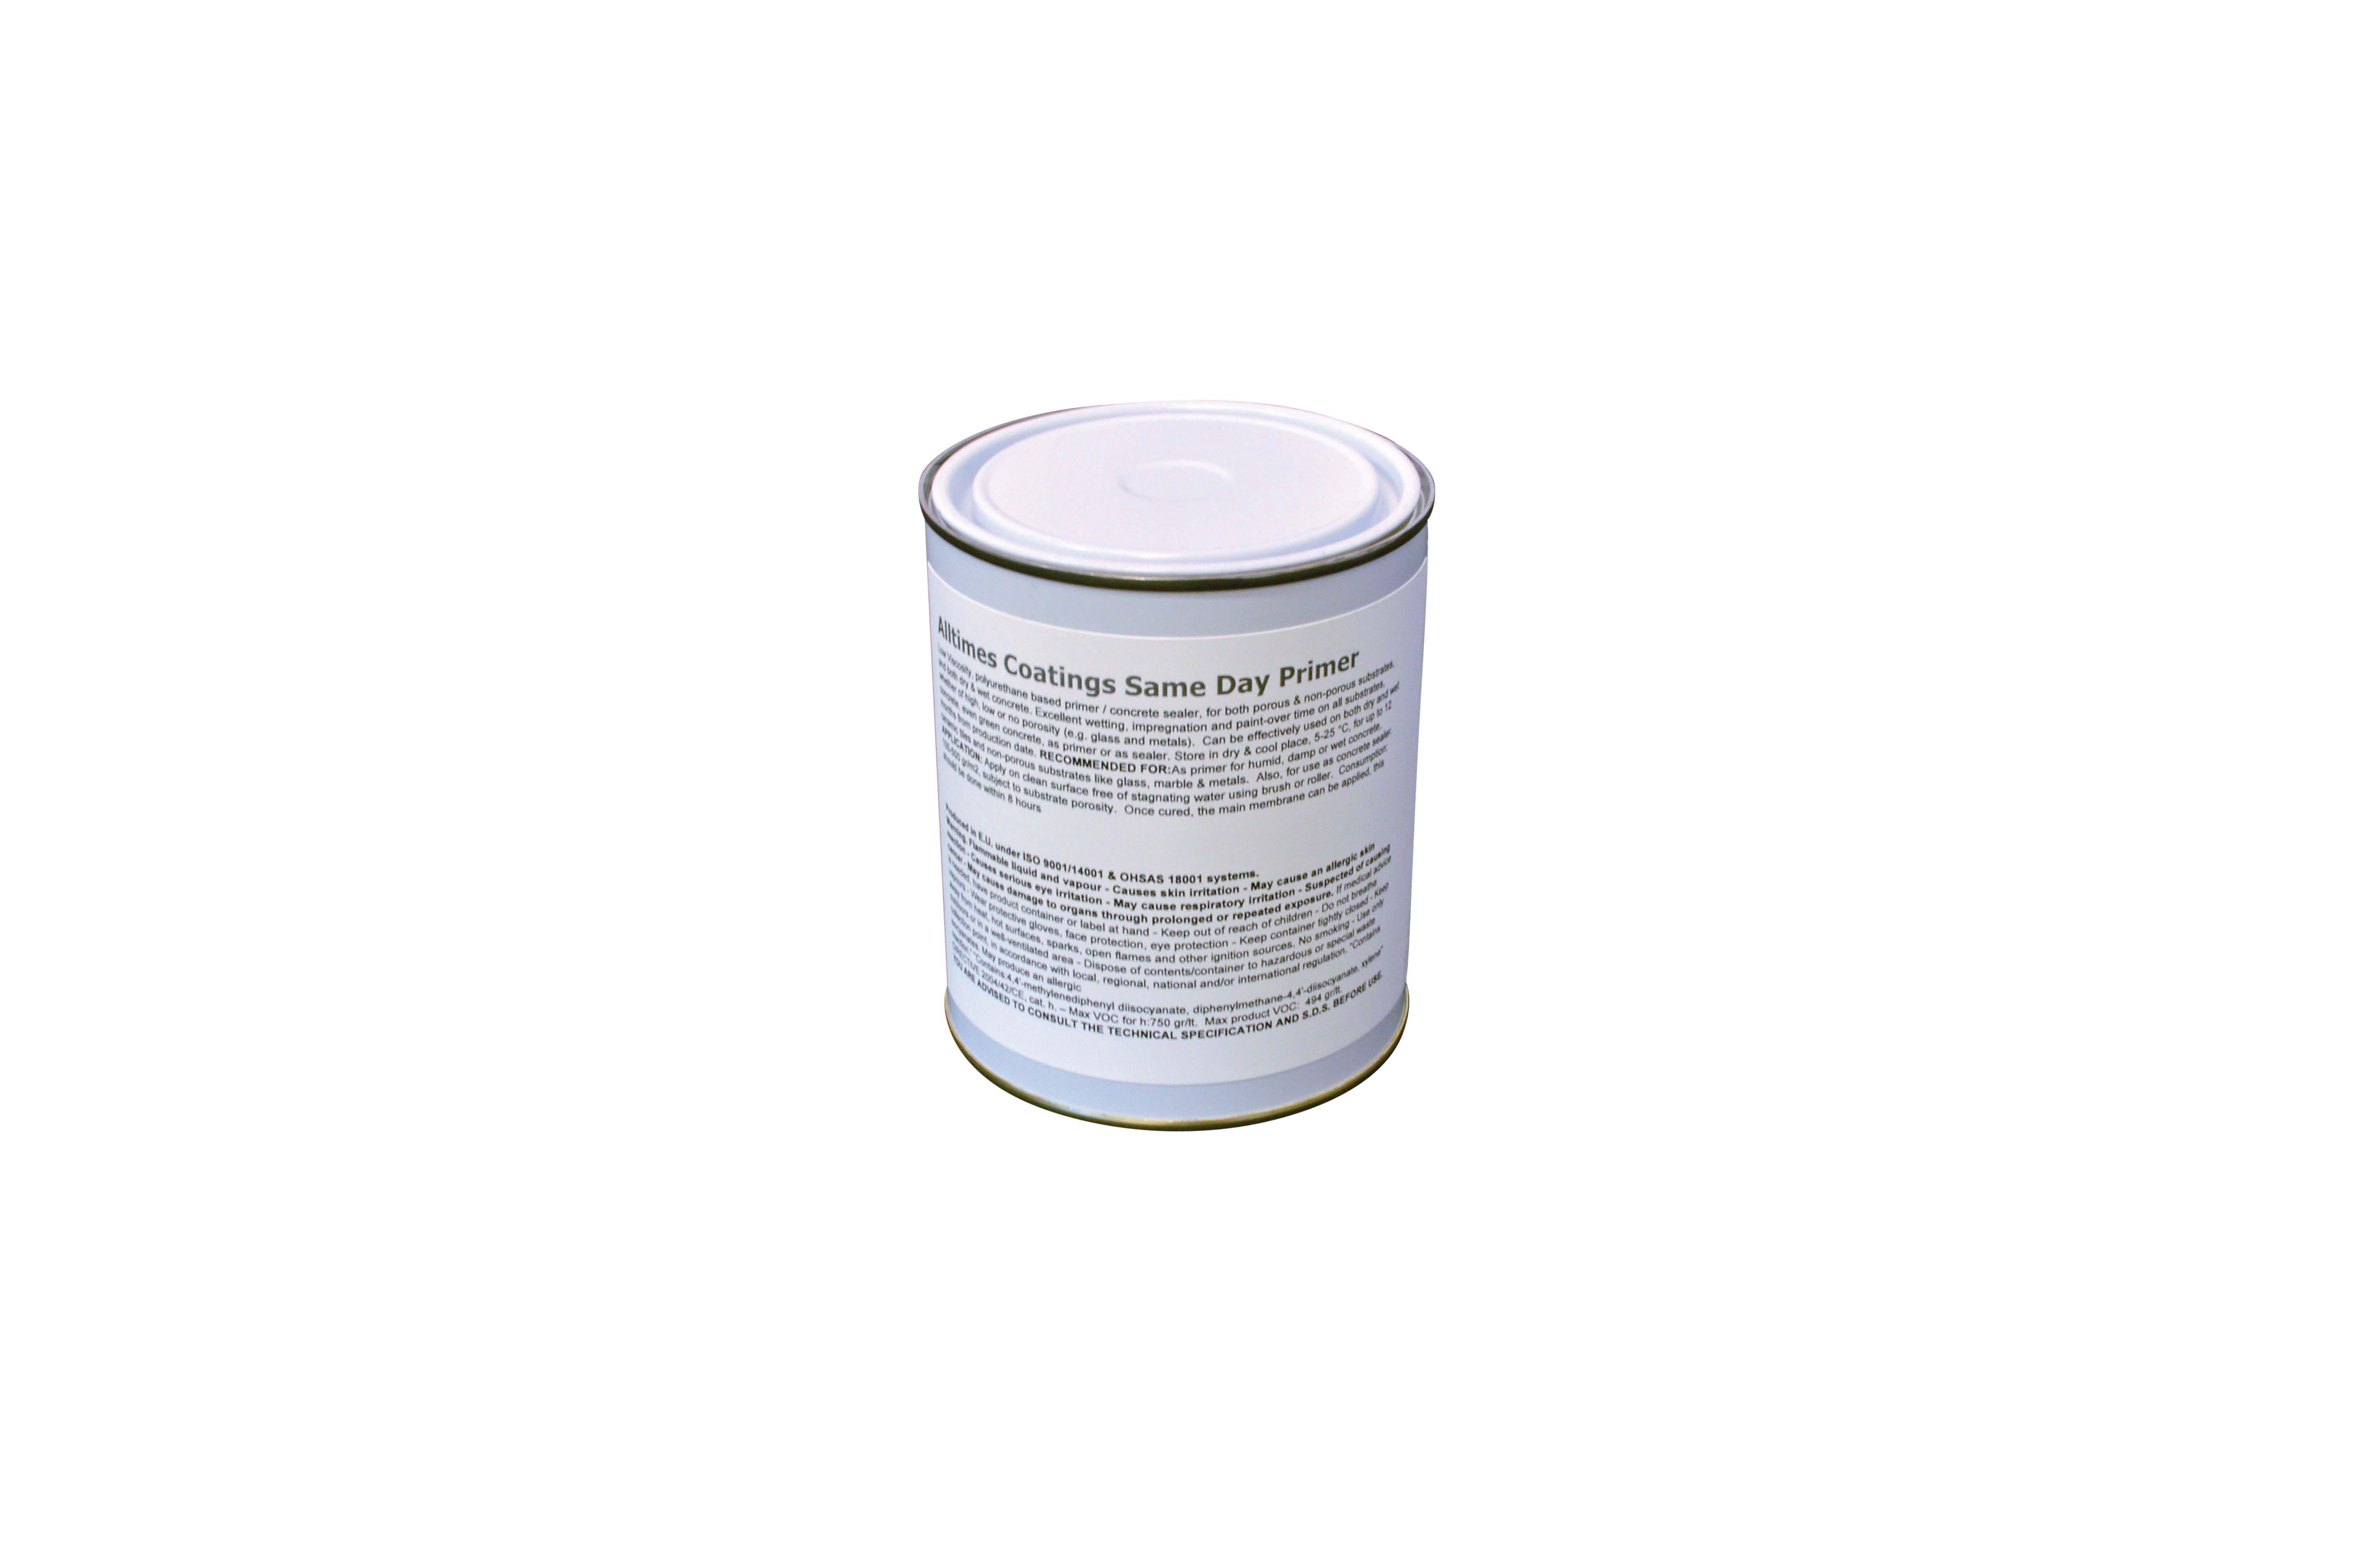 Apply 1 coat of EPDM liquid rubber roof coating & get 25